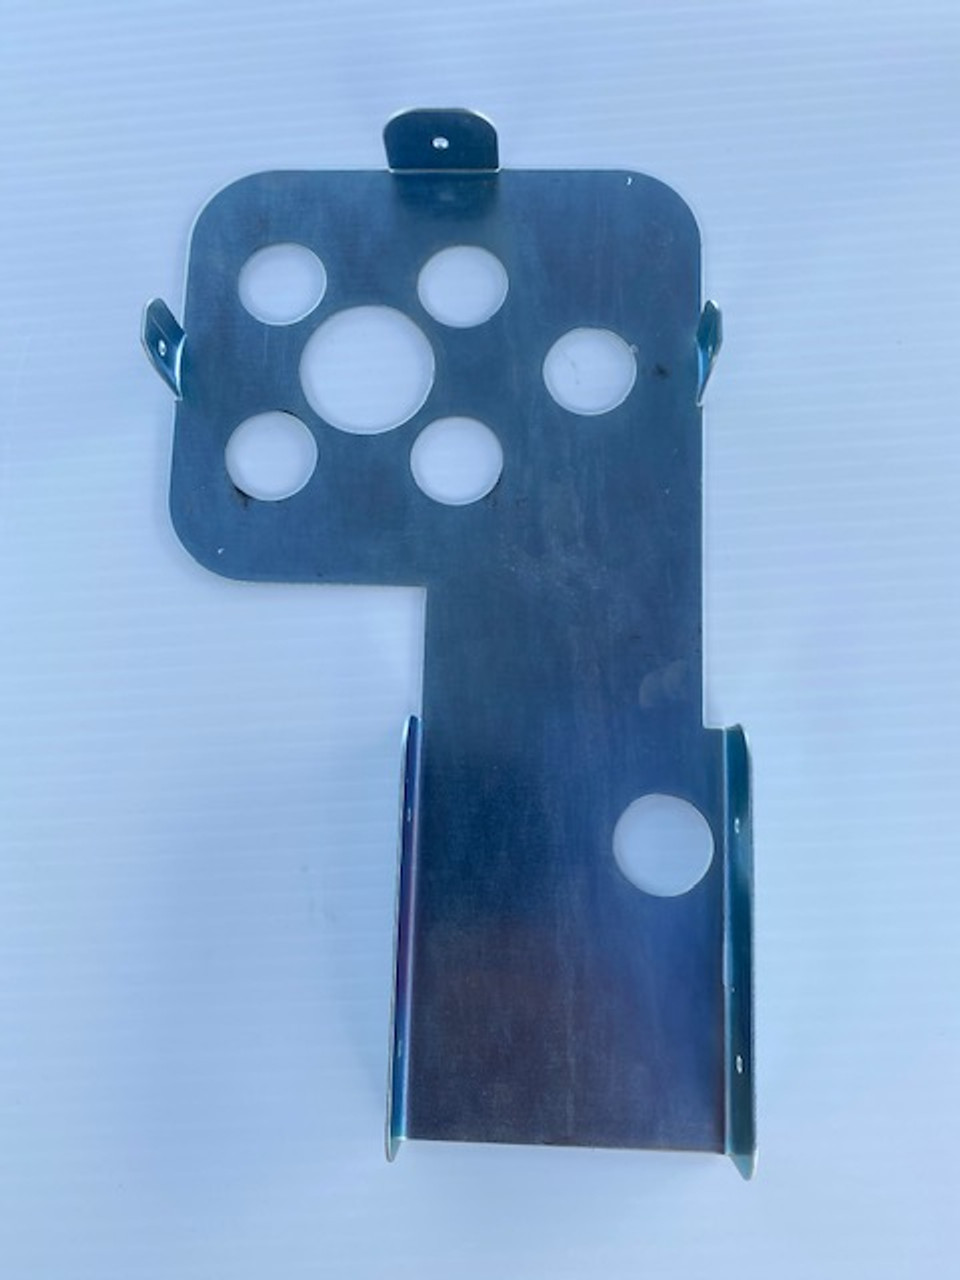 2 HP Electric Gear Motor 90:1 12VDC w/cover 5 hole  3 yr warranty